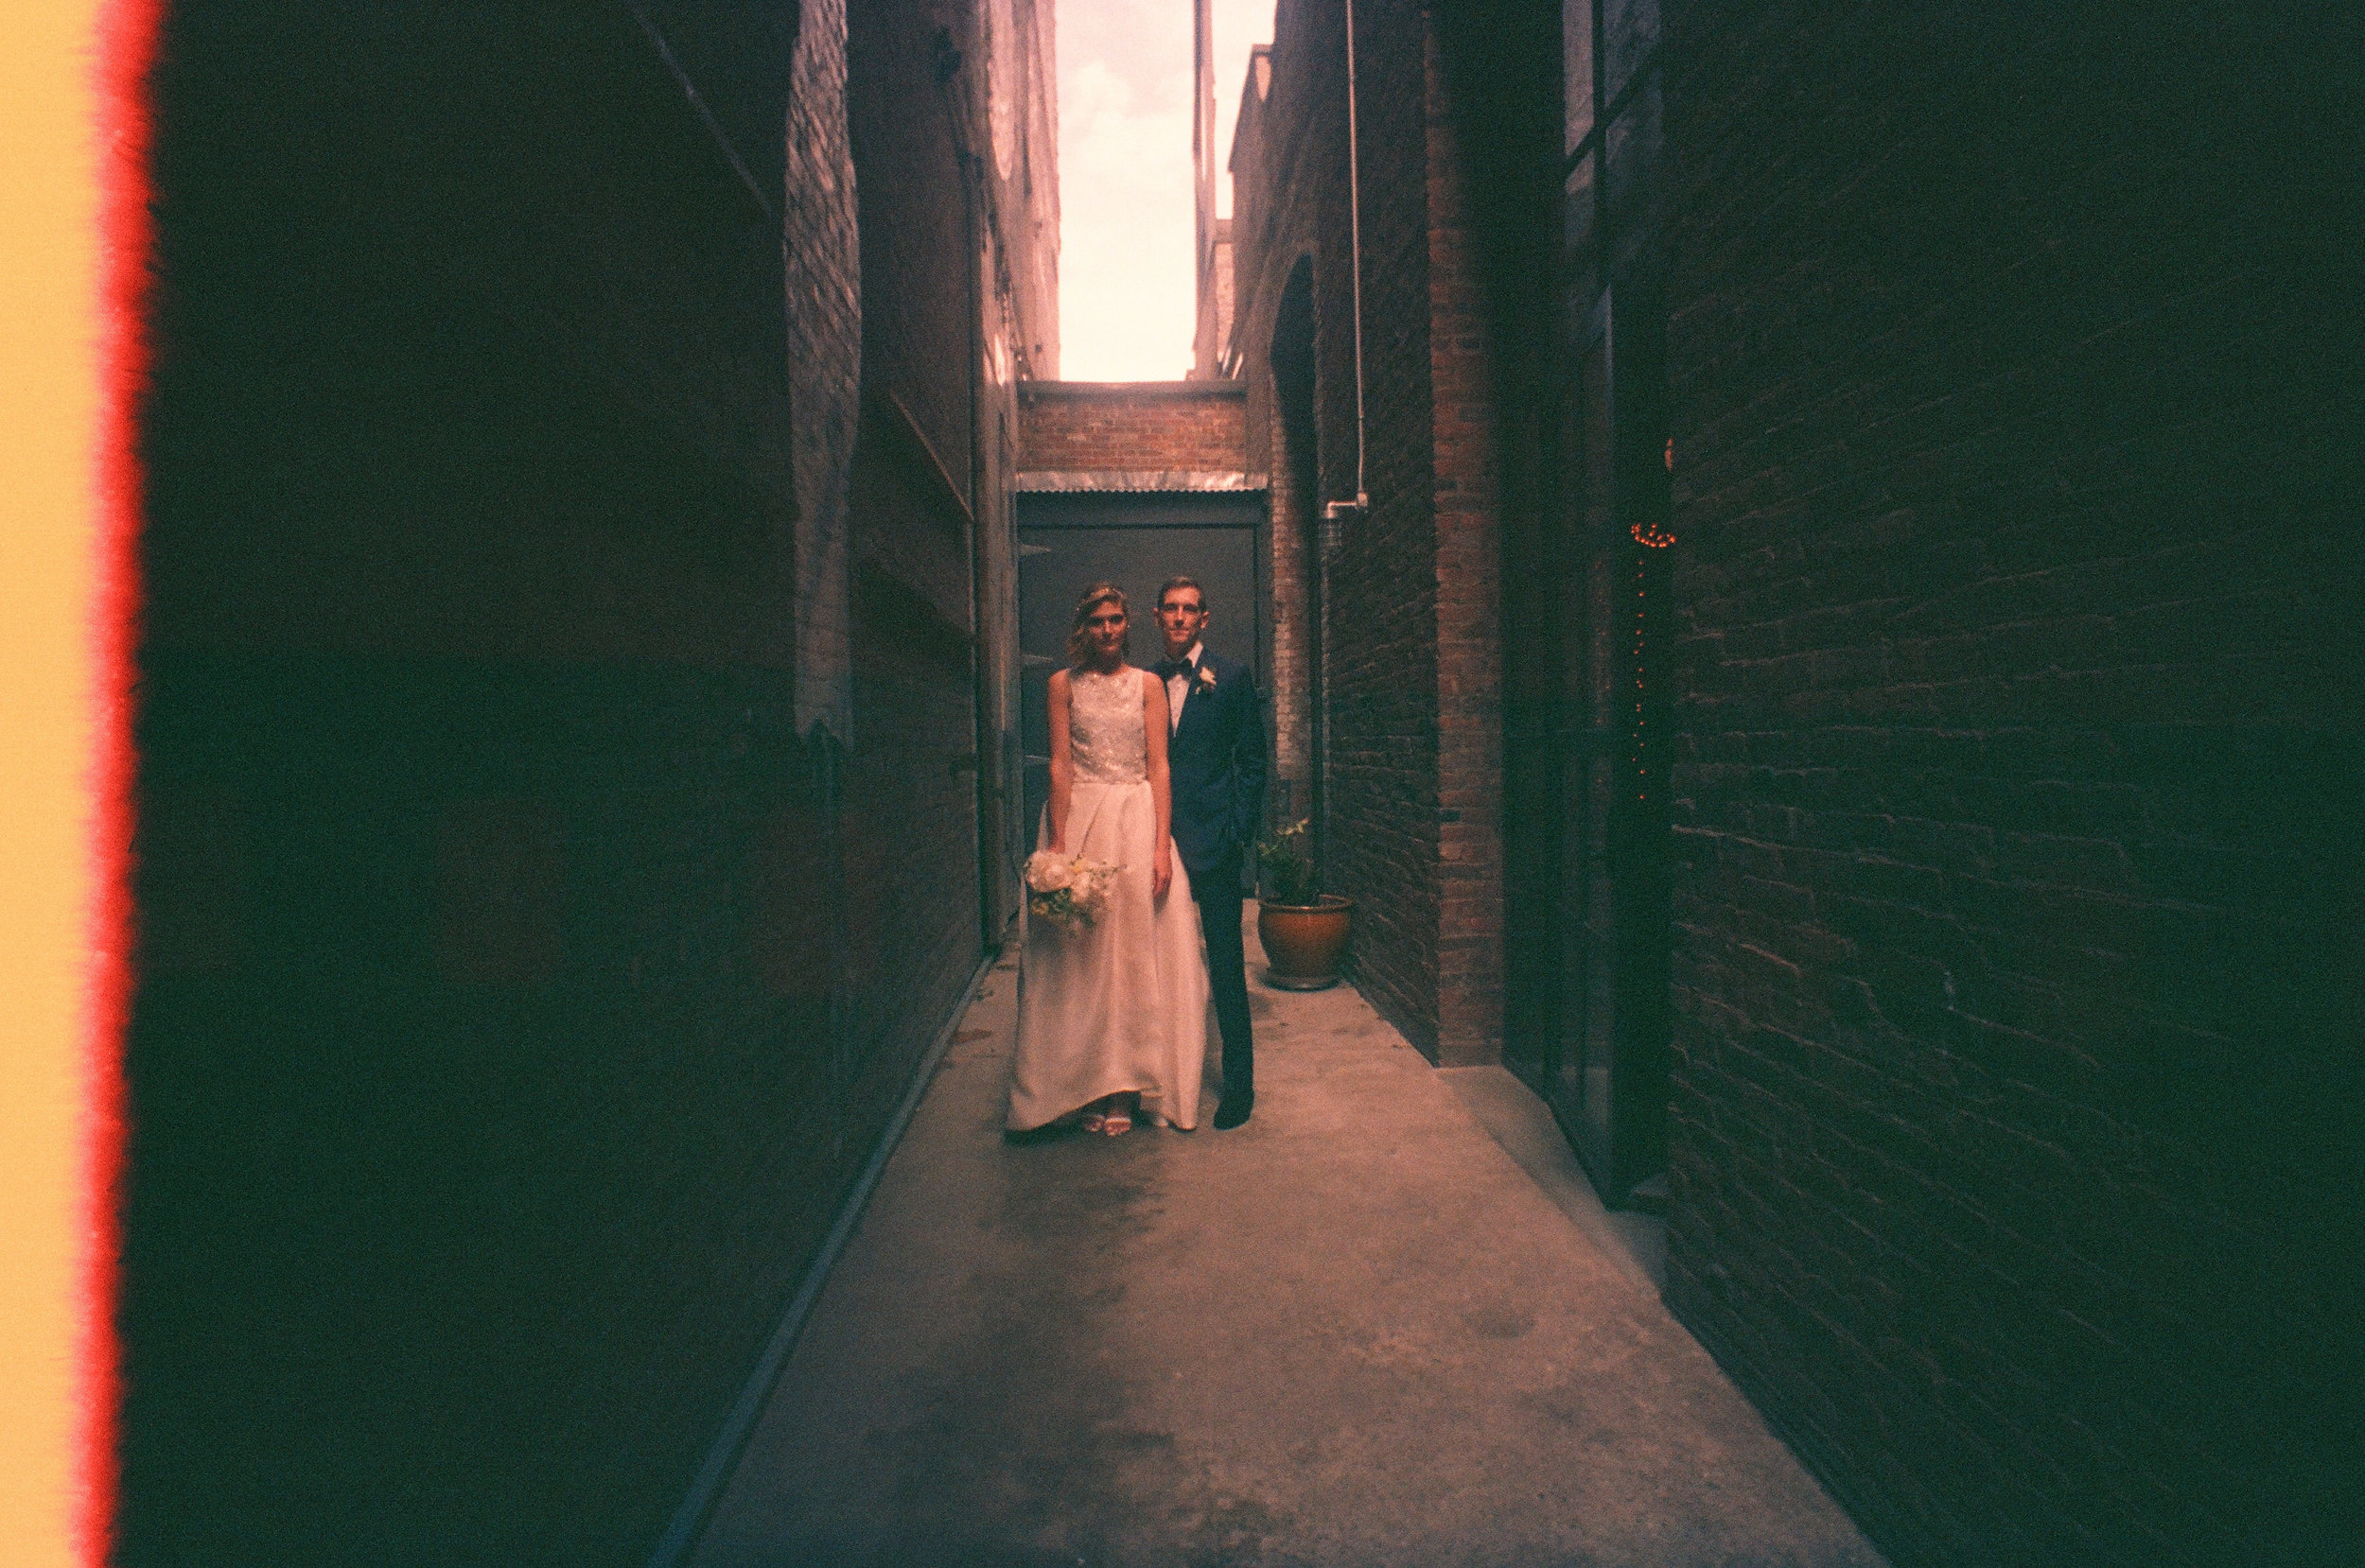 35mmfilmweddingphotographerlightleaksdoubleexposurebrooklyn(135of146).jpg